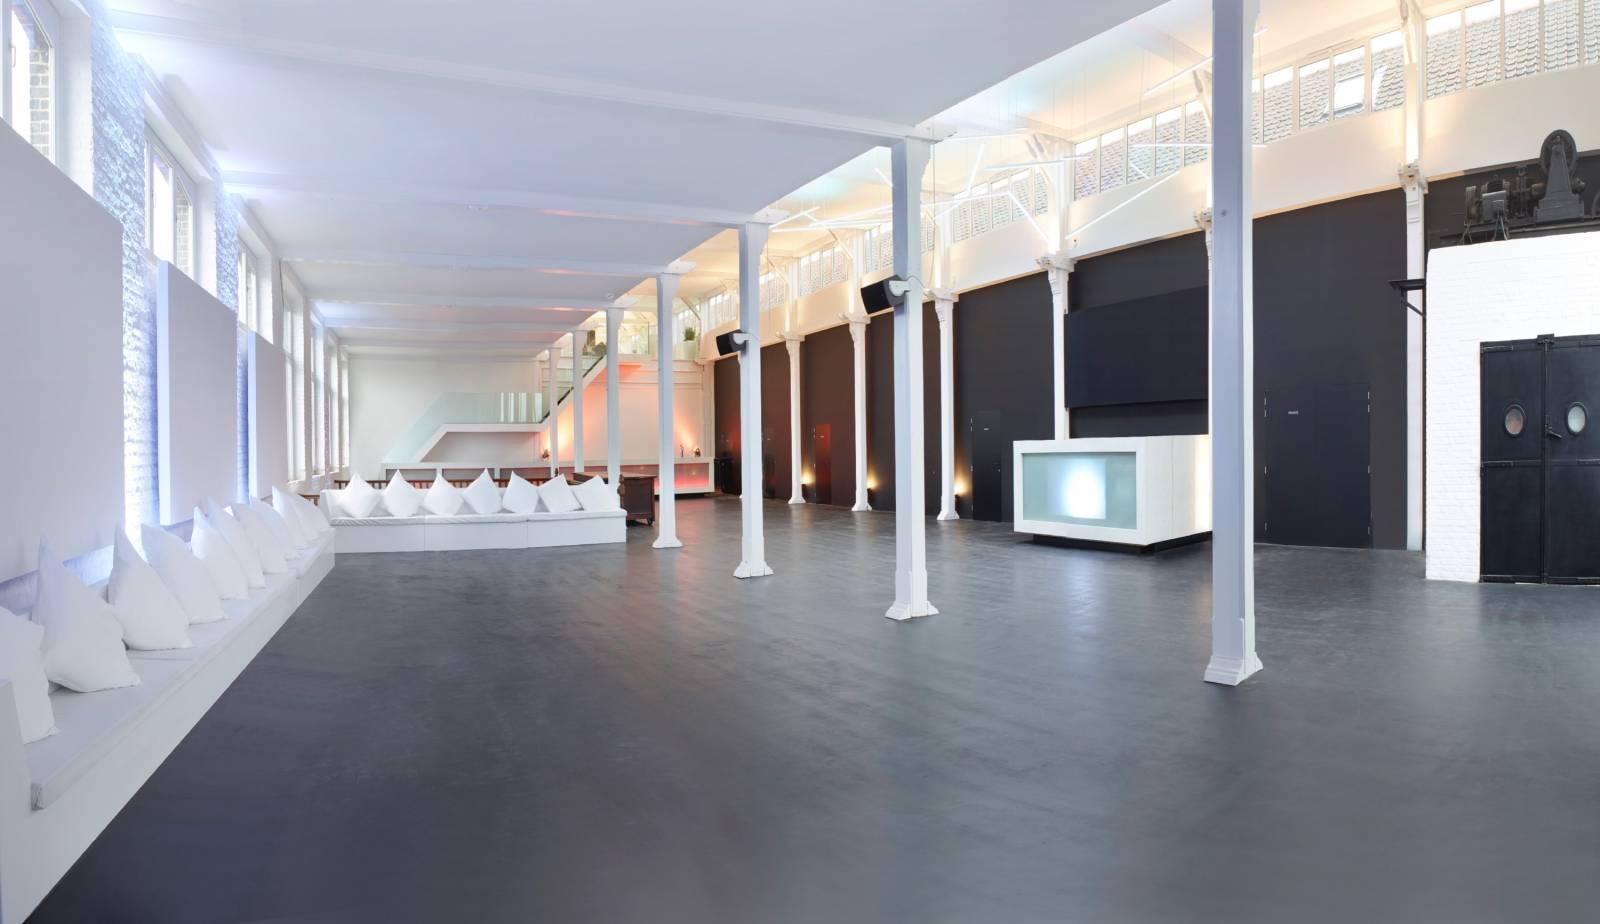 Zaal Lux - Feestzaal -  House of Weddings - 35